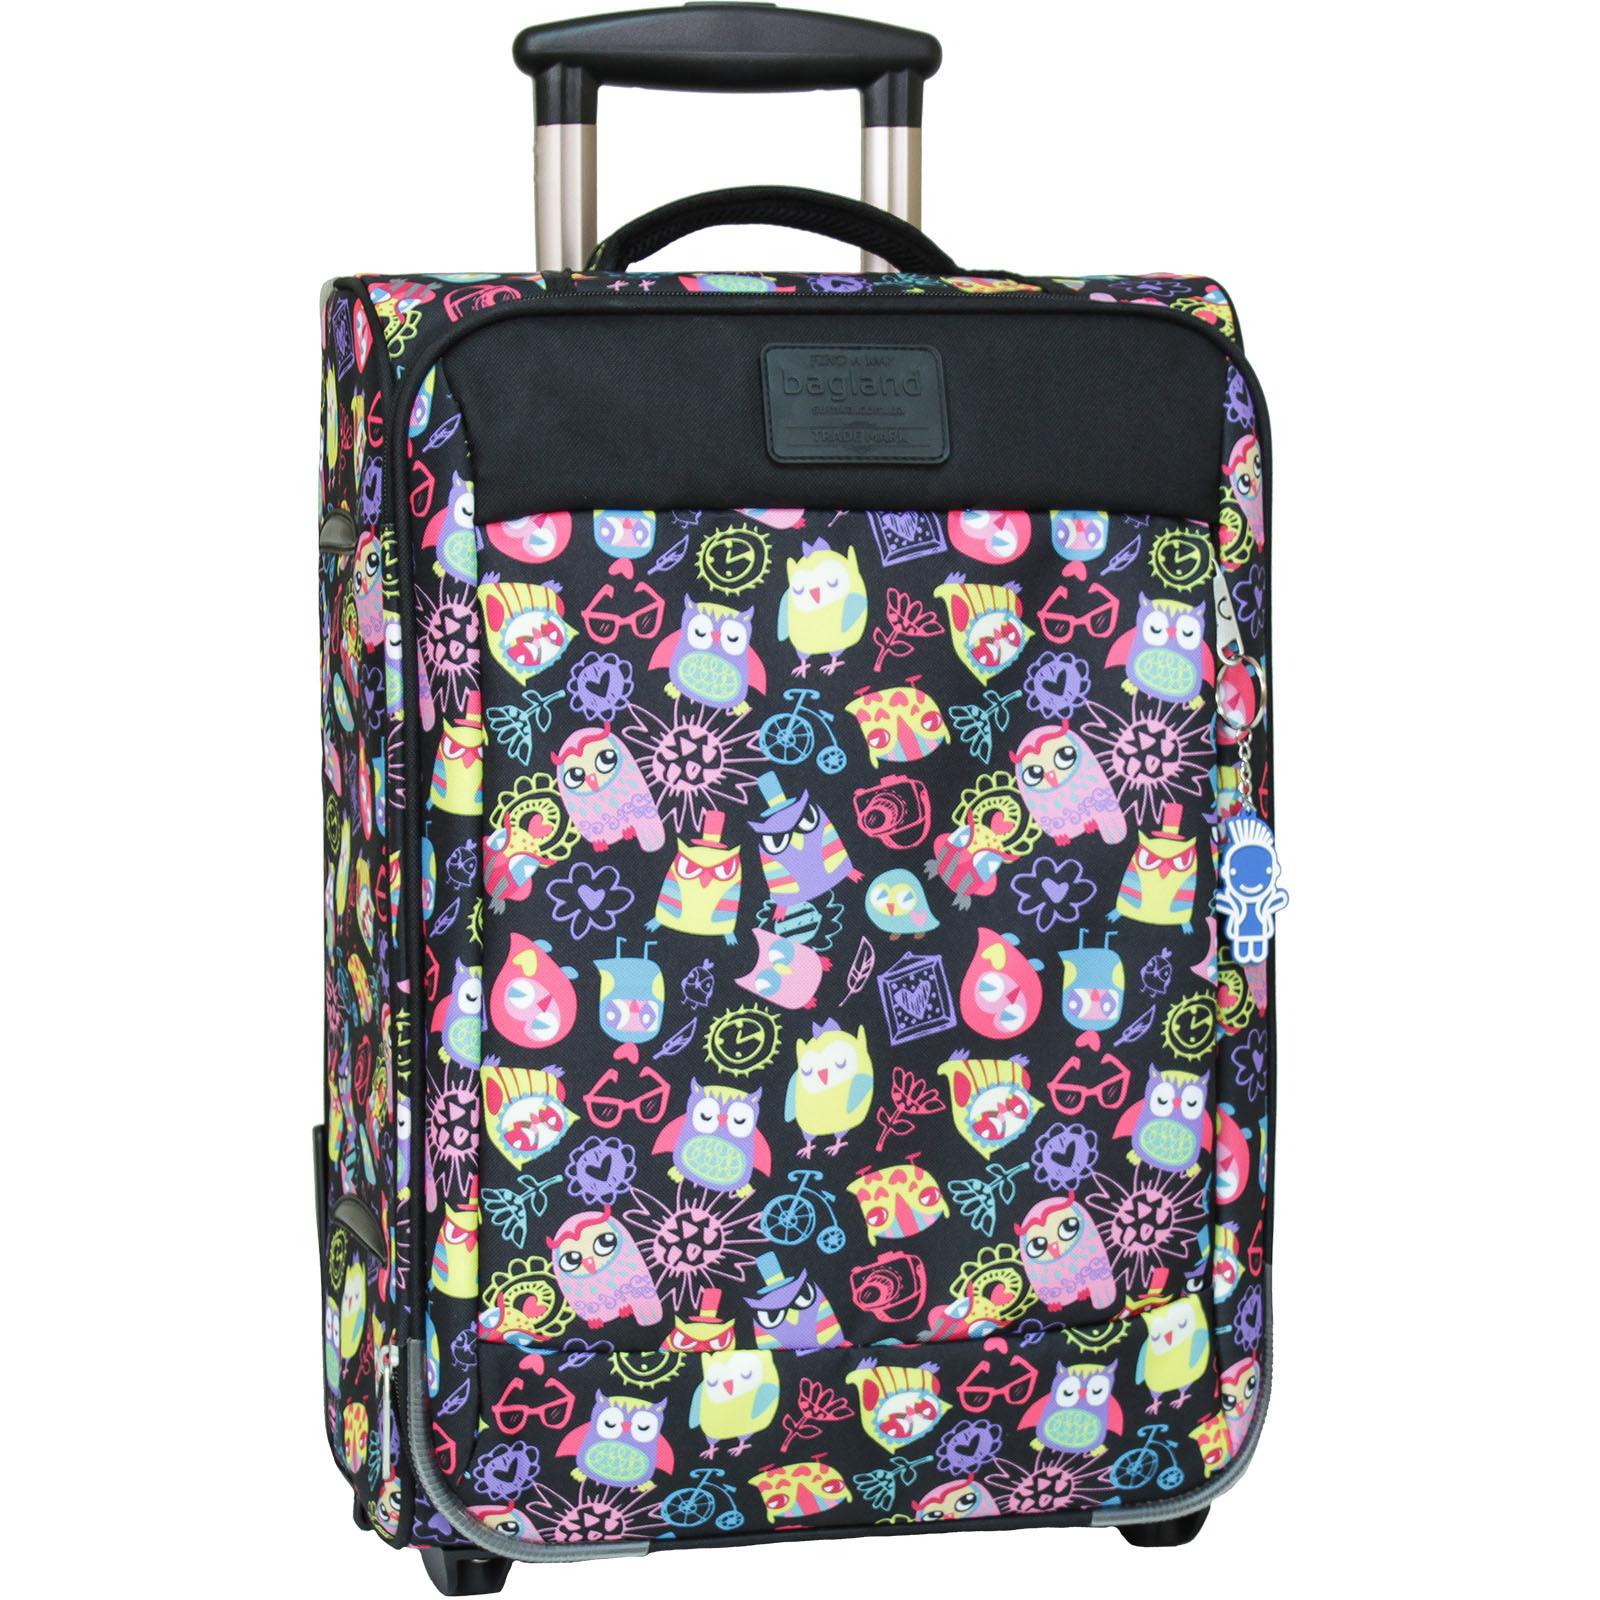 Дорожные чемоданы Чемодан Bagland Vichenzo 32 л. сублимация (45) (0037666194) IMG_8658-1600.jpg